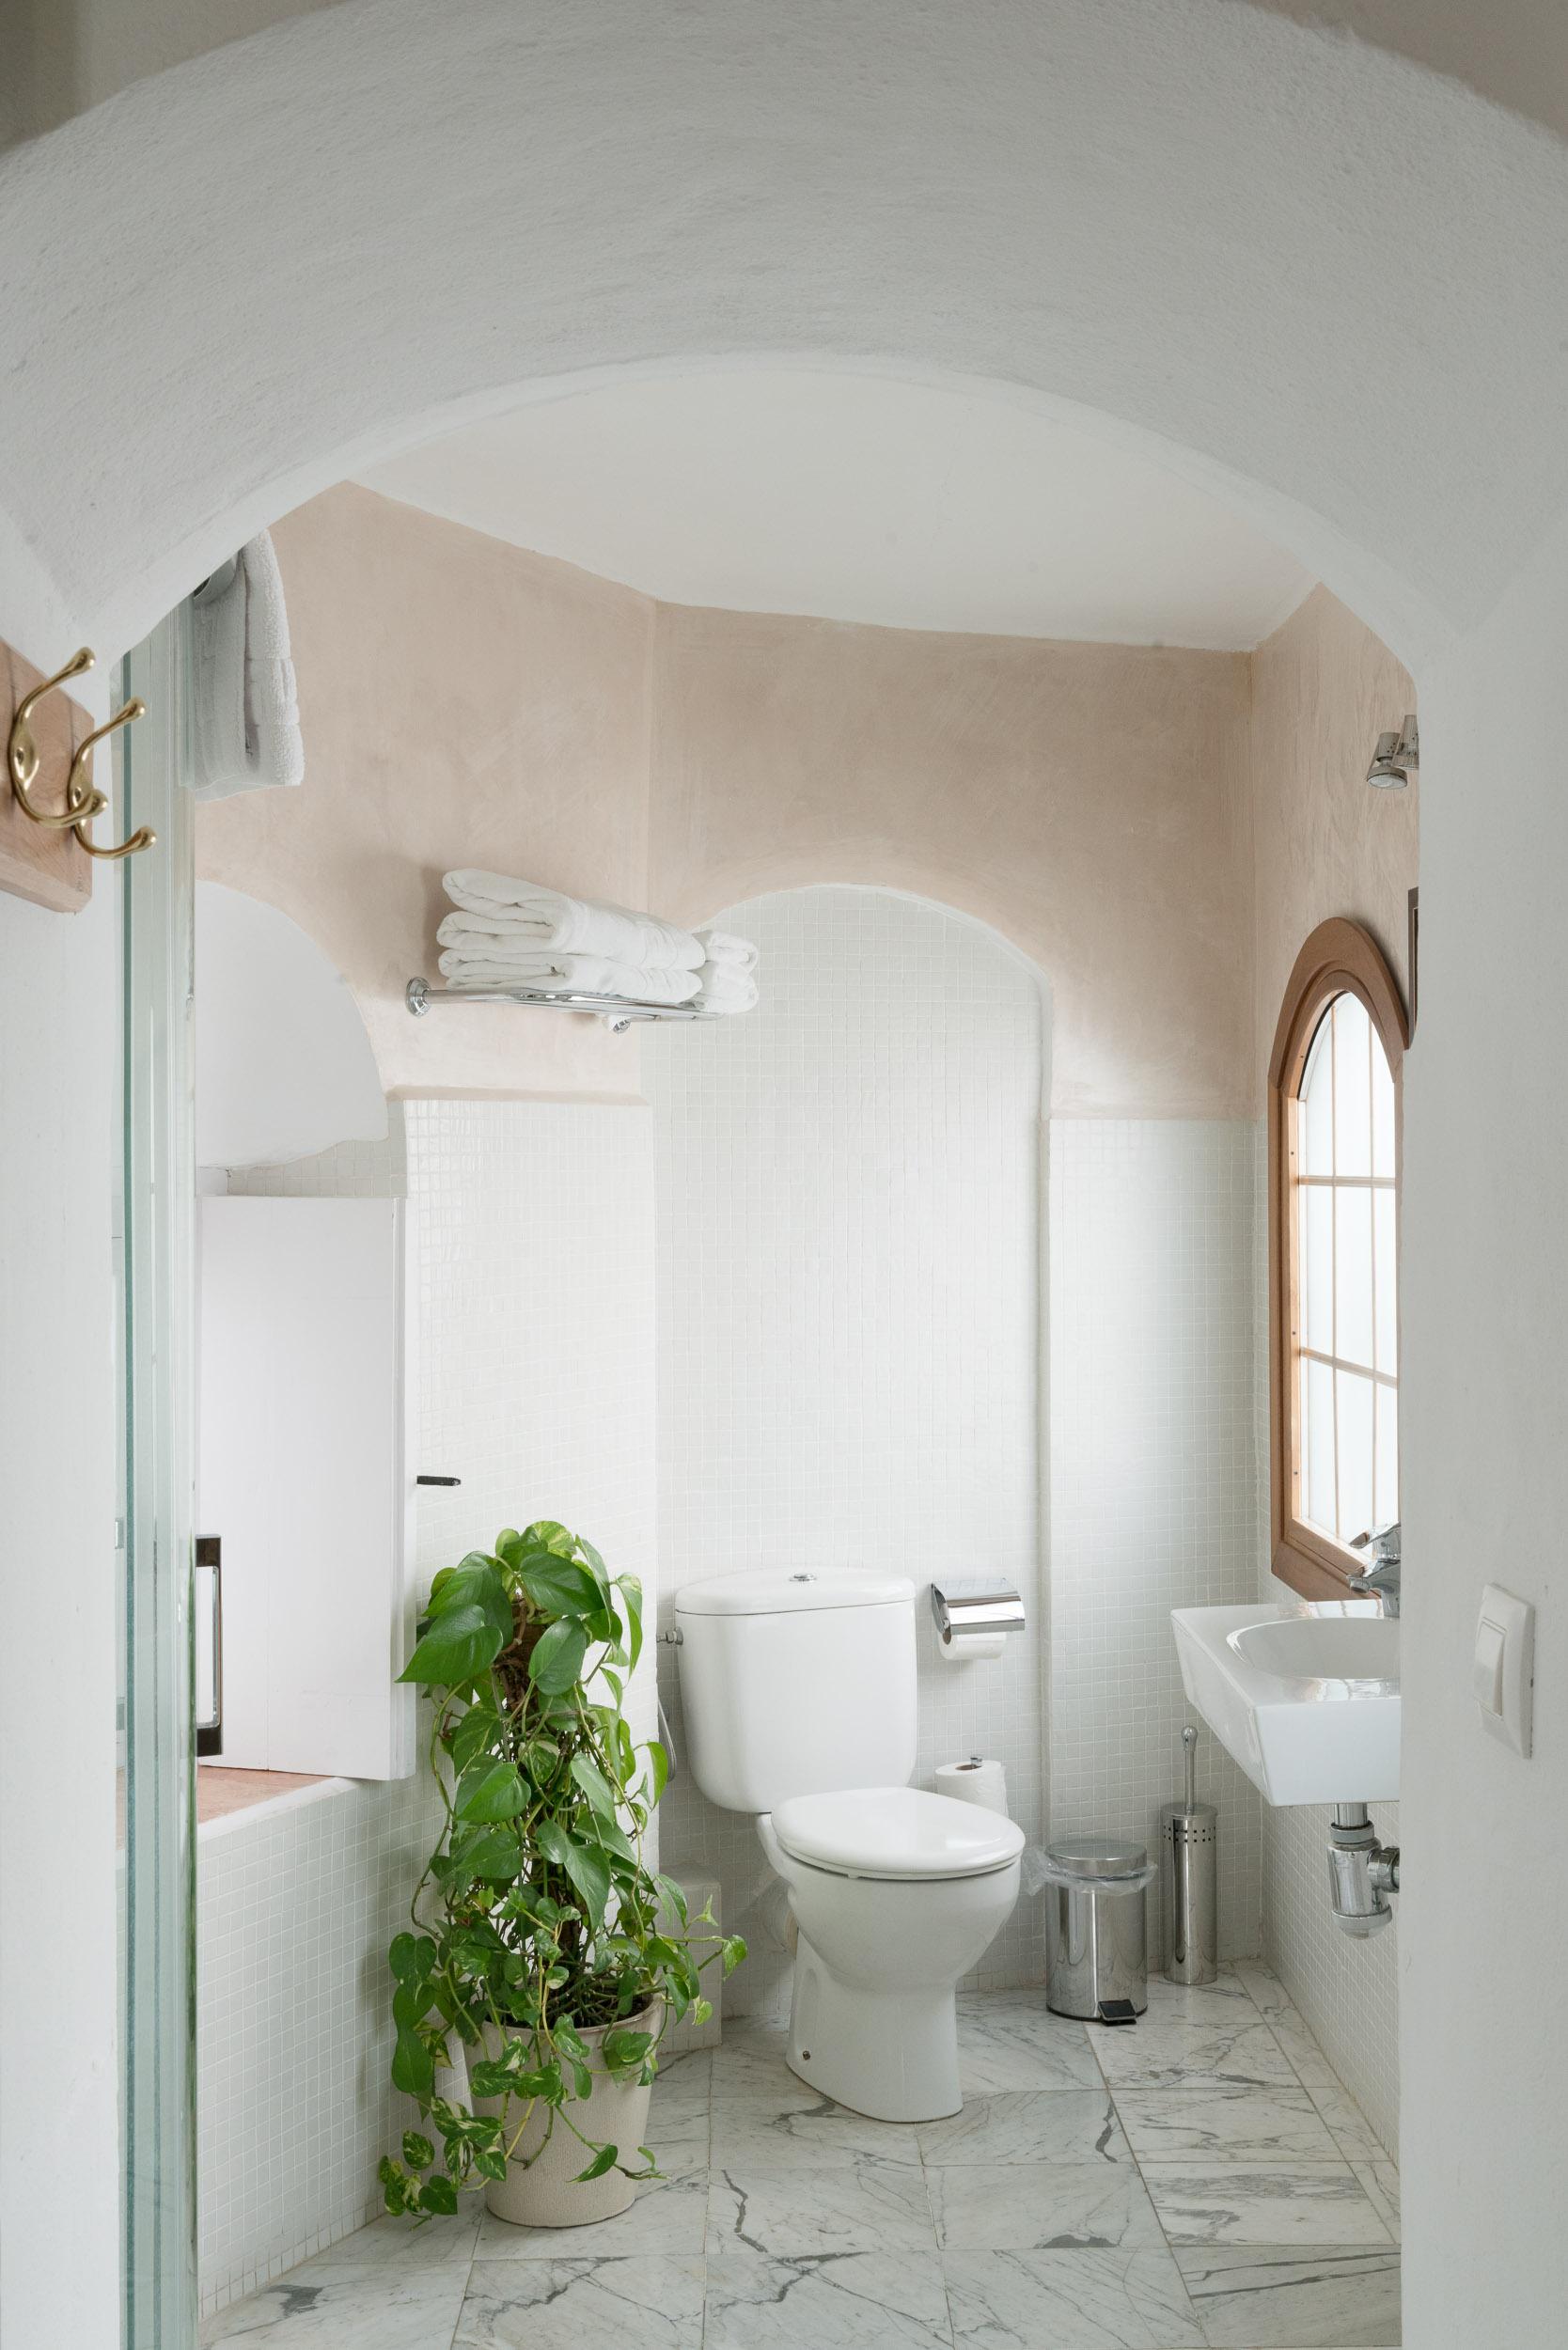 the_getaway_edit_hotel_casa_del_califa_vejer_de_la_frontera-2.jpg